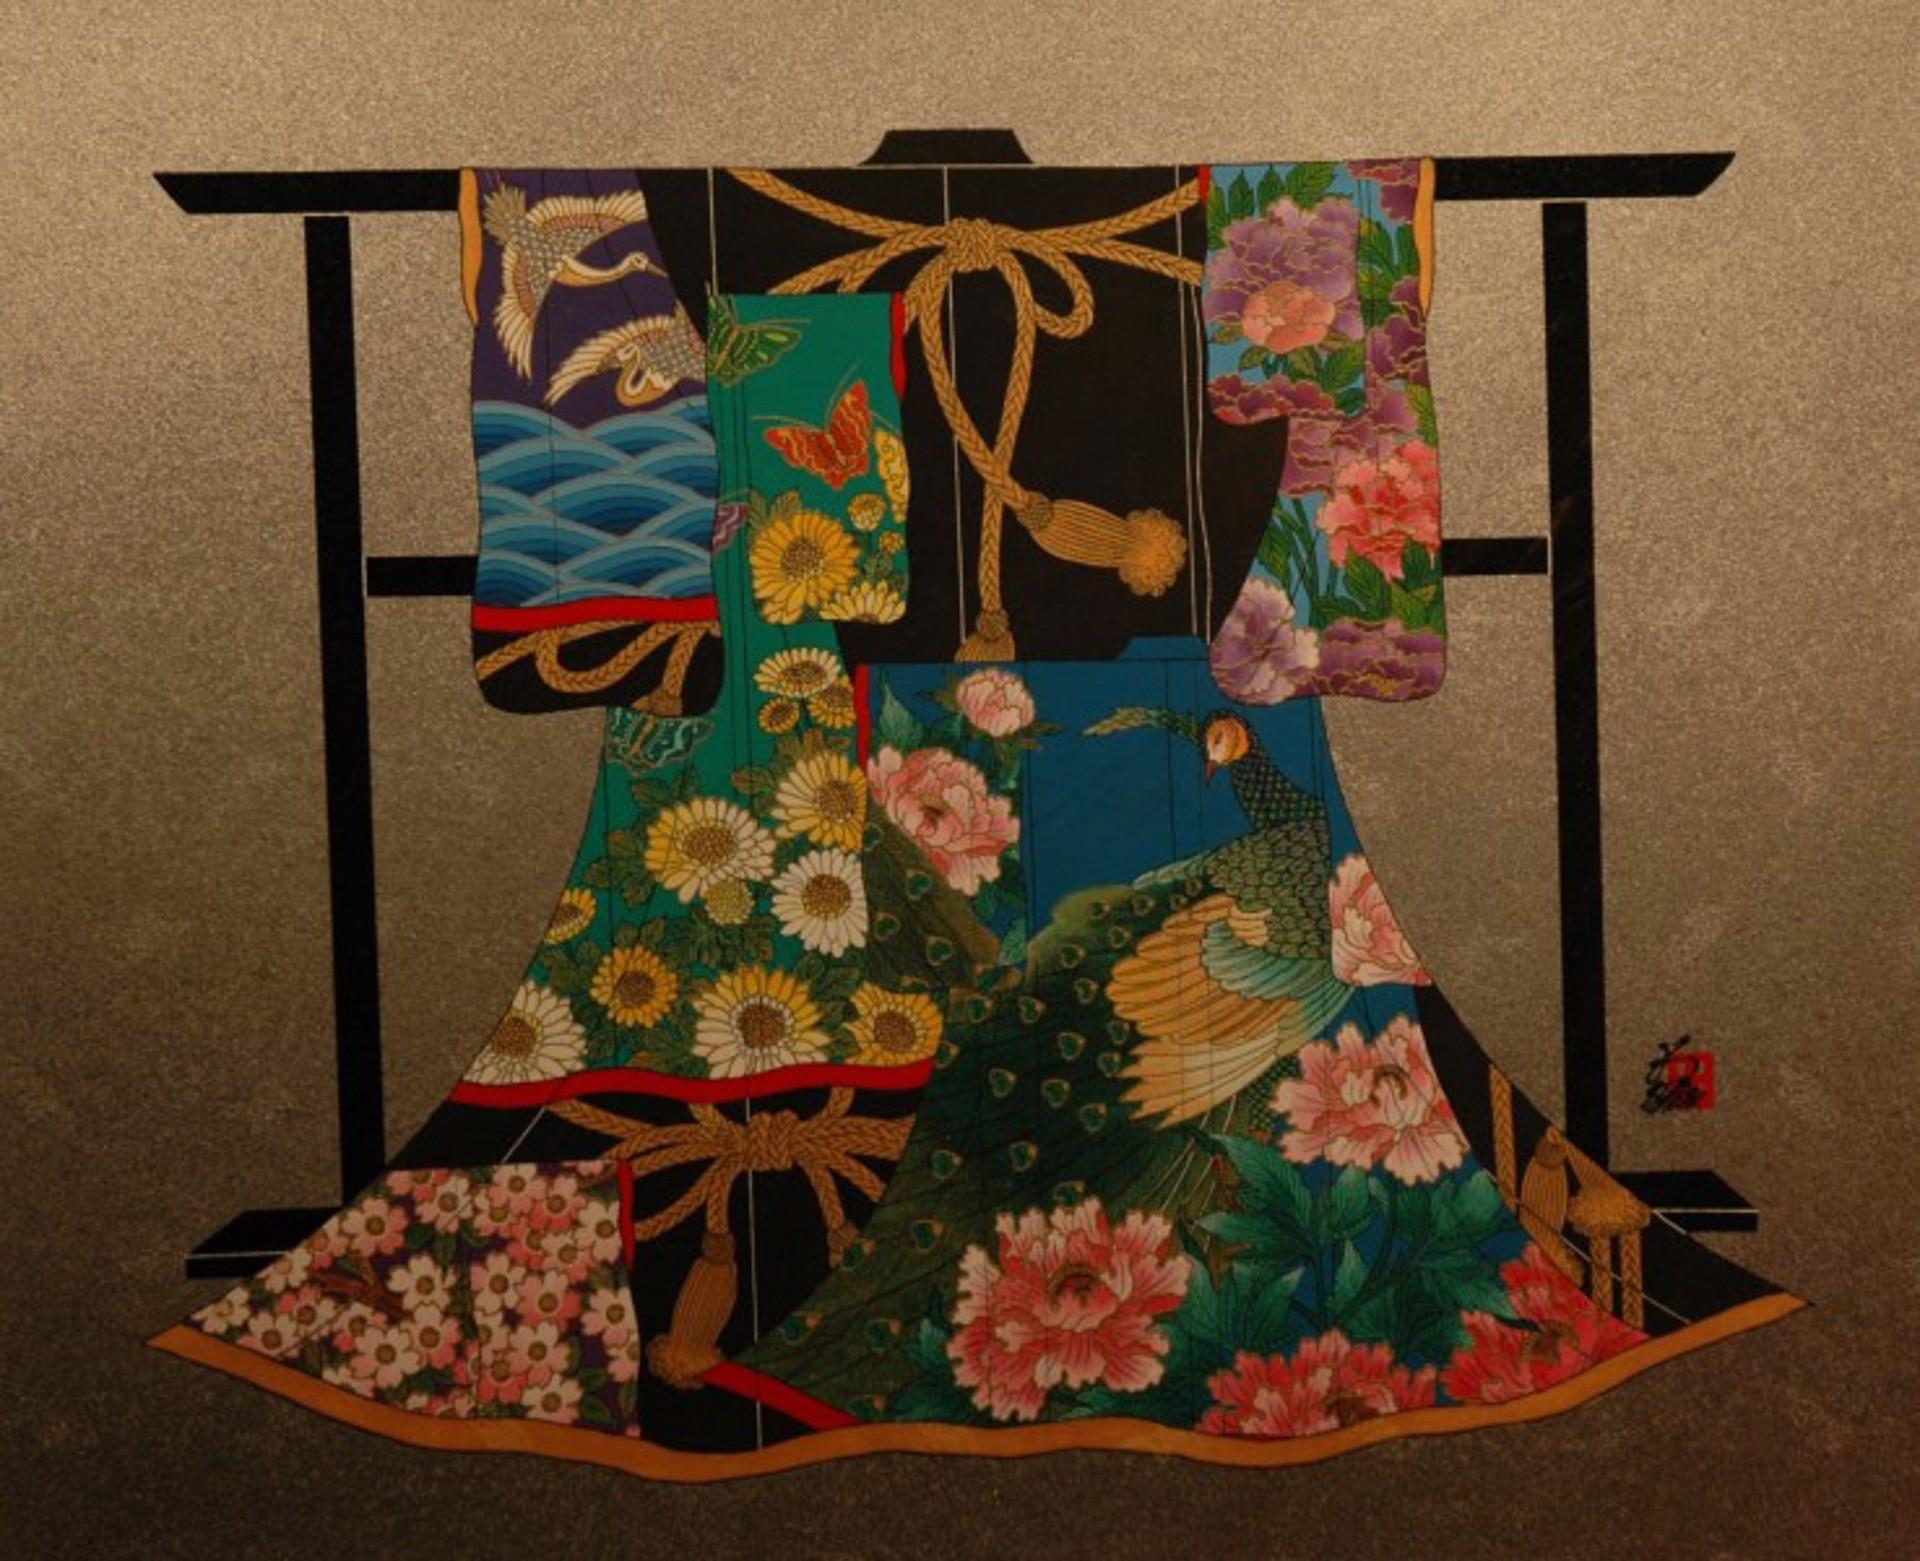 Fantasy Kimonos by Hisashi Otsuka